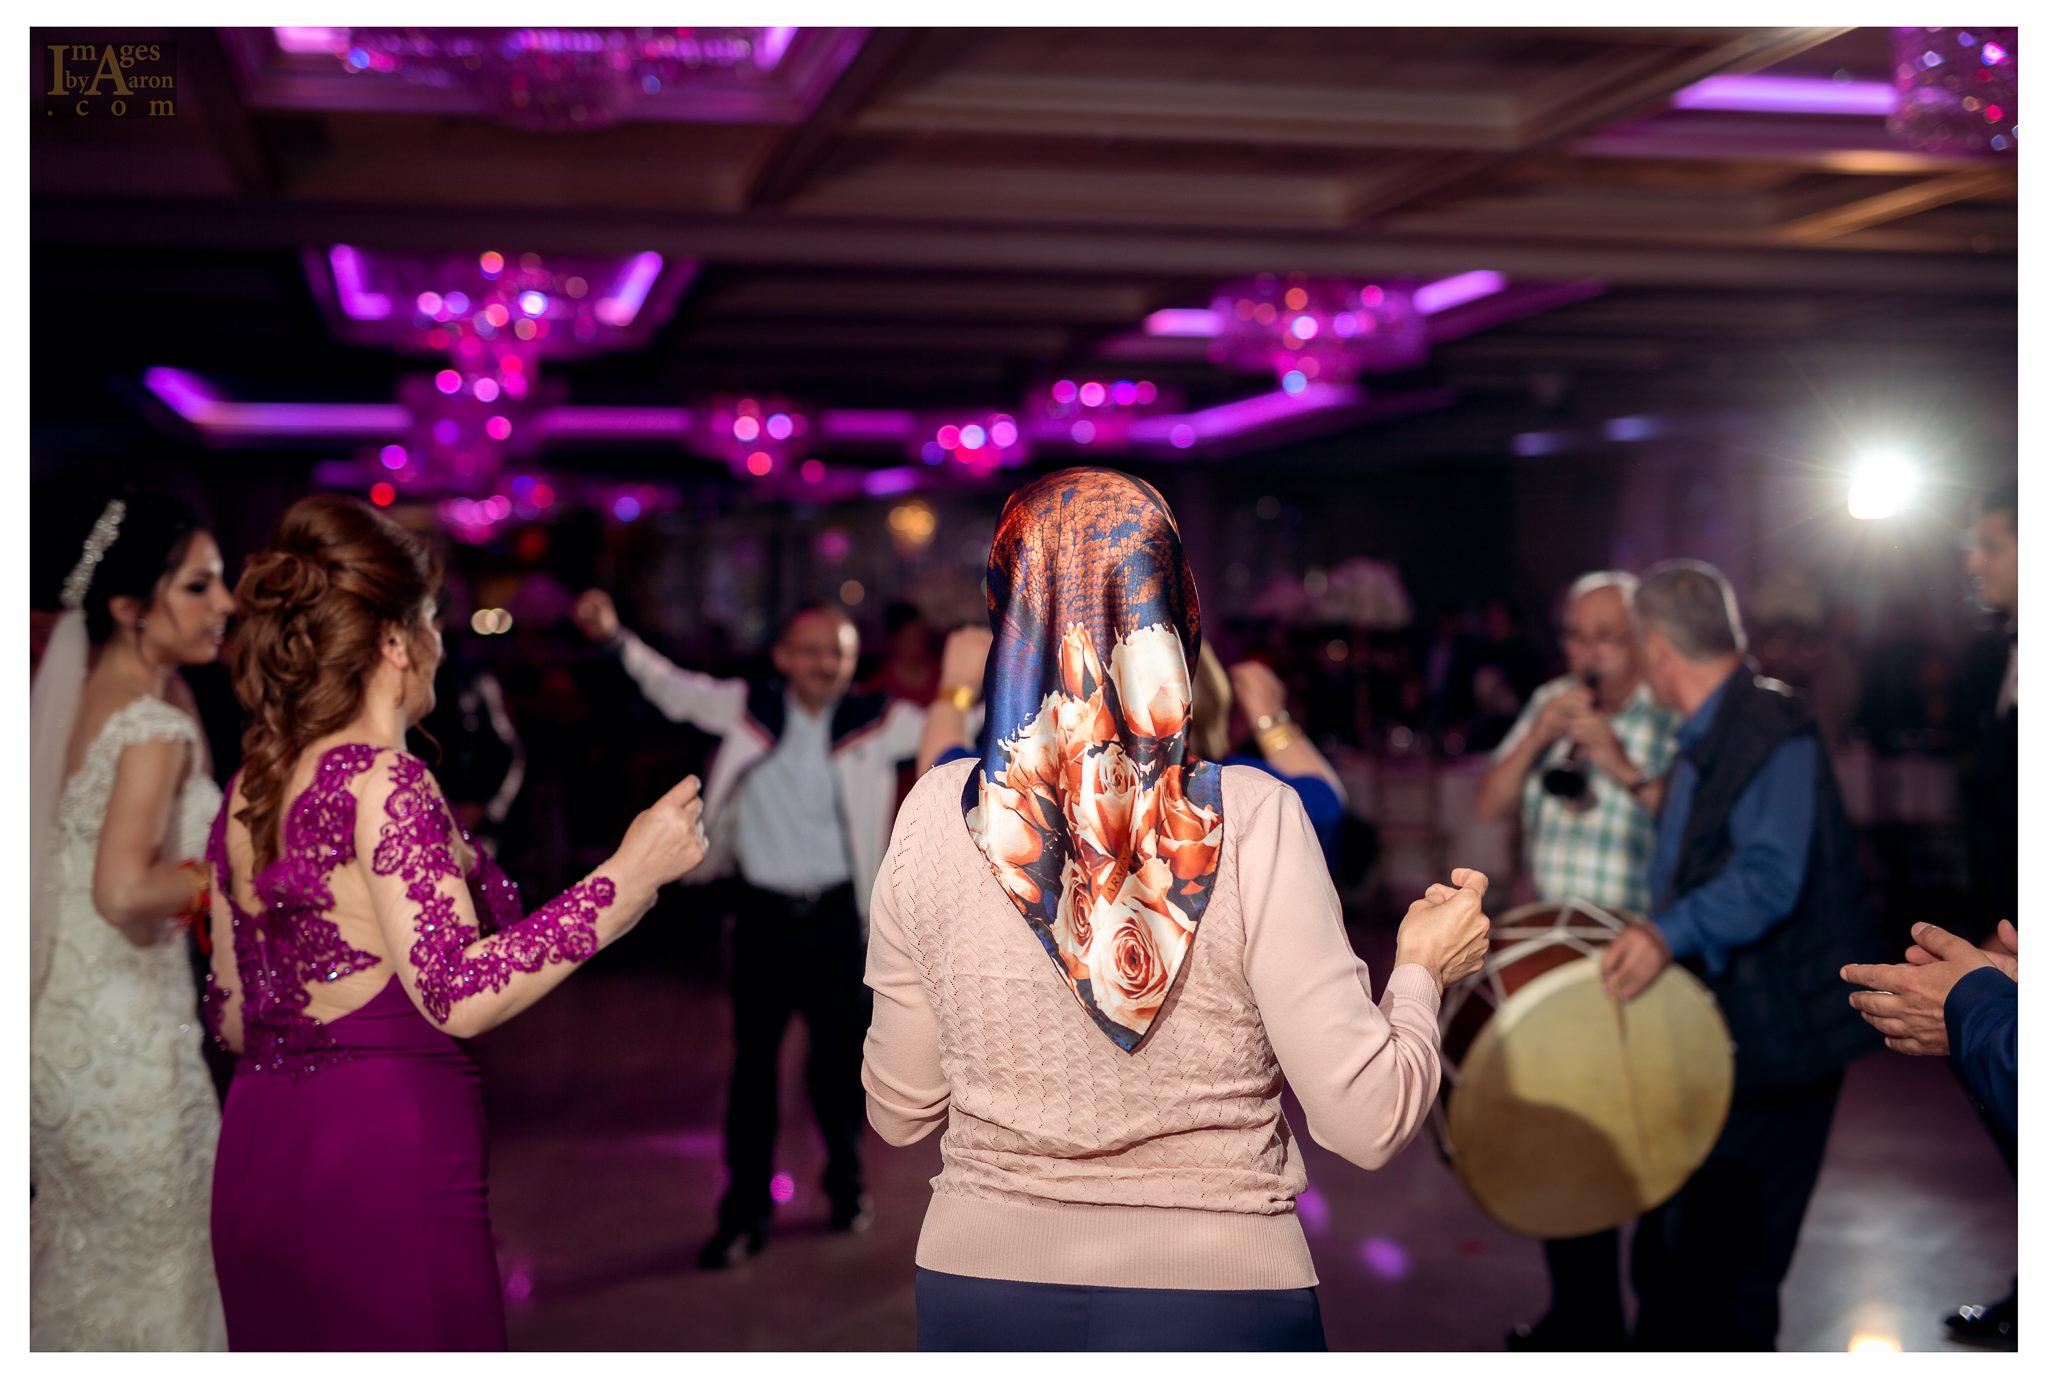 Gokce Turkish Wedding Reception New York Photographer Wedding Photography The Royal Manor-31.jpg